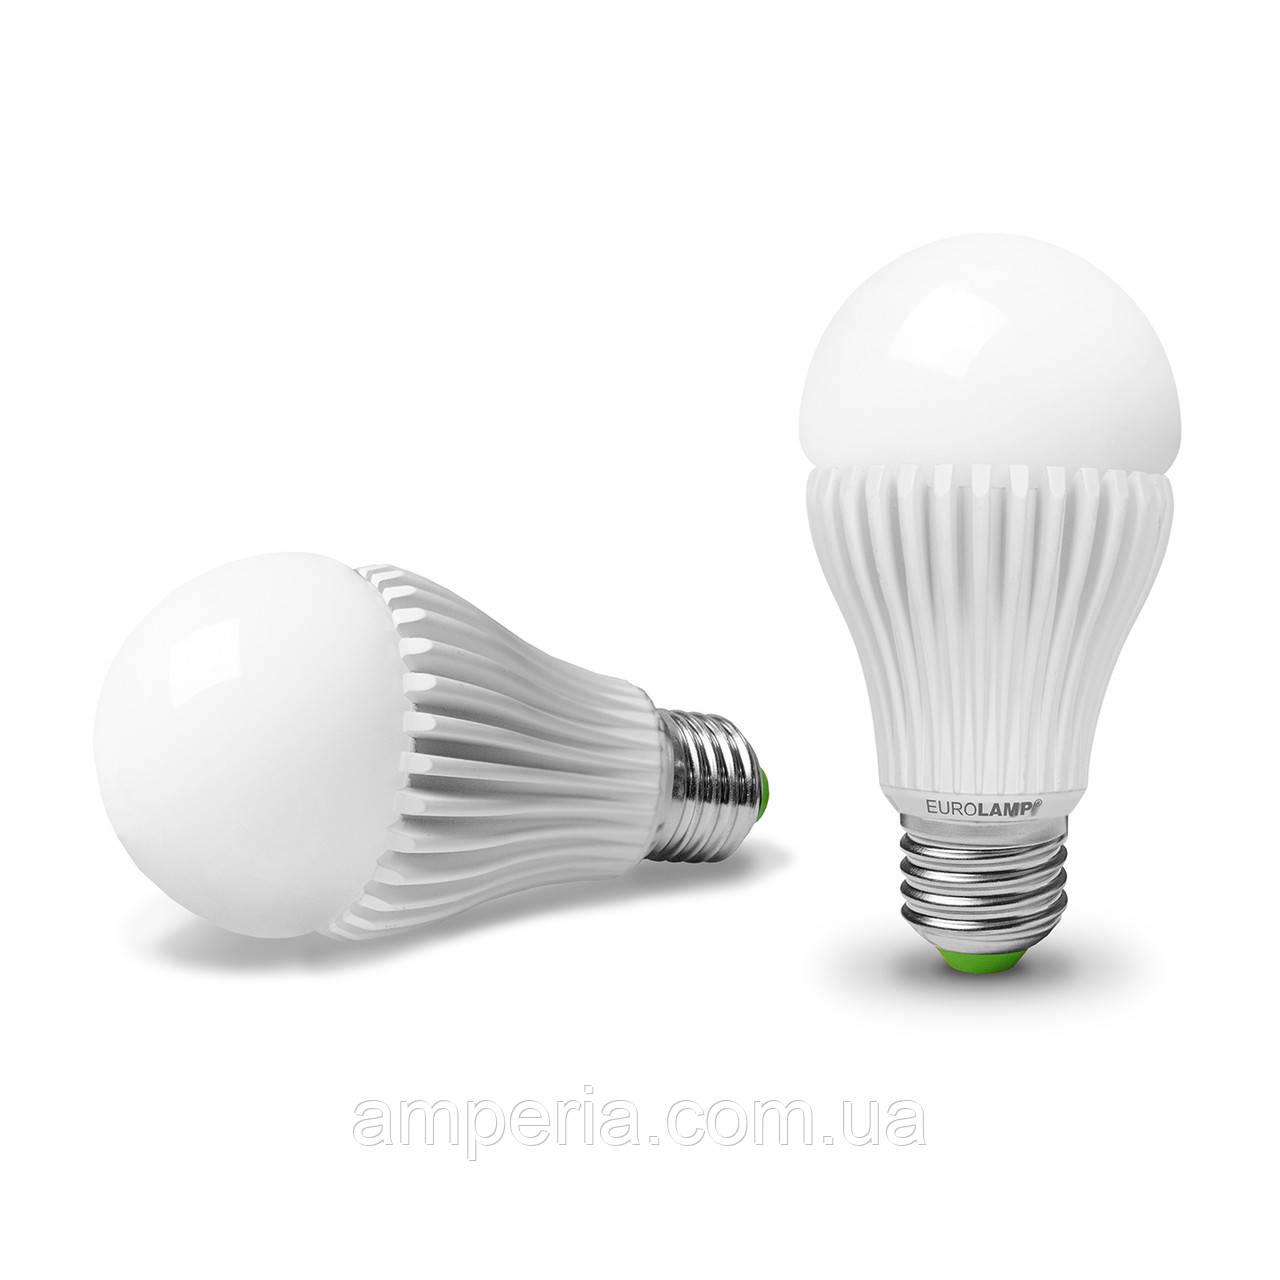 EUROLAMP LED Лампа ЕКО A65 15W E27 4000K (LED-A65-15274(D))